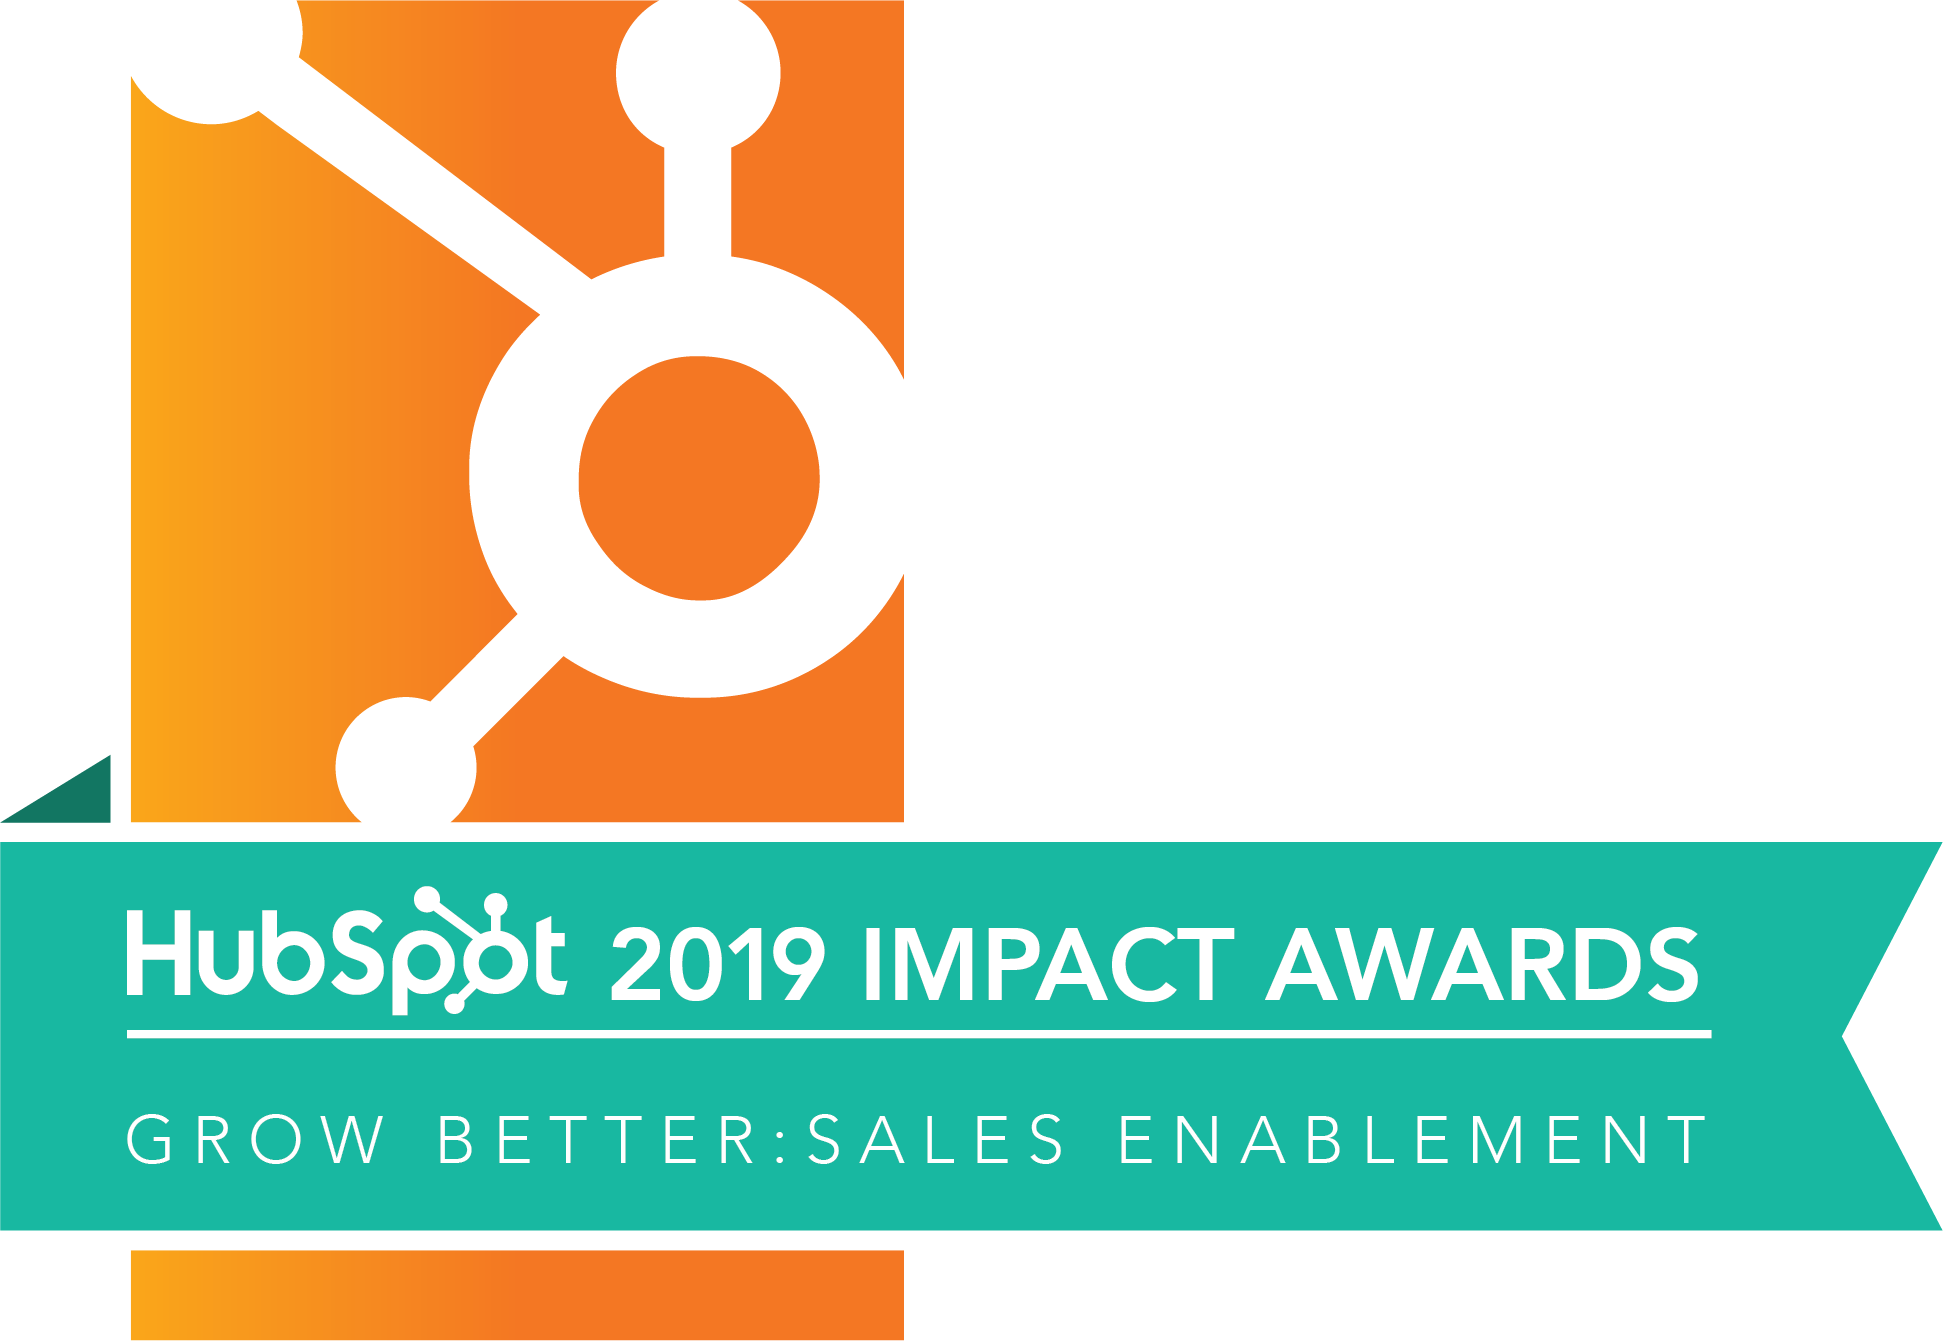 Hubspot_ImpactAwards_2019_SalesEnablement-01